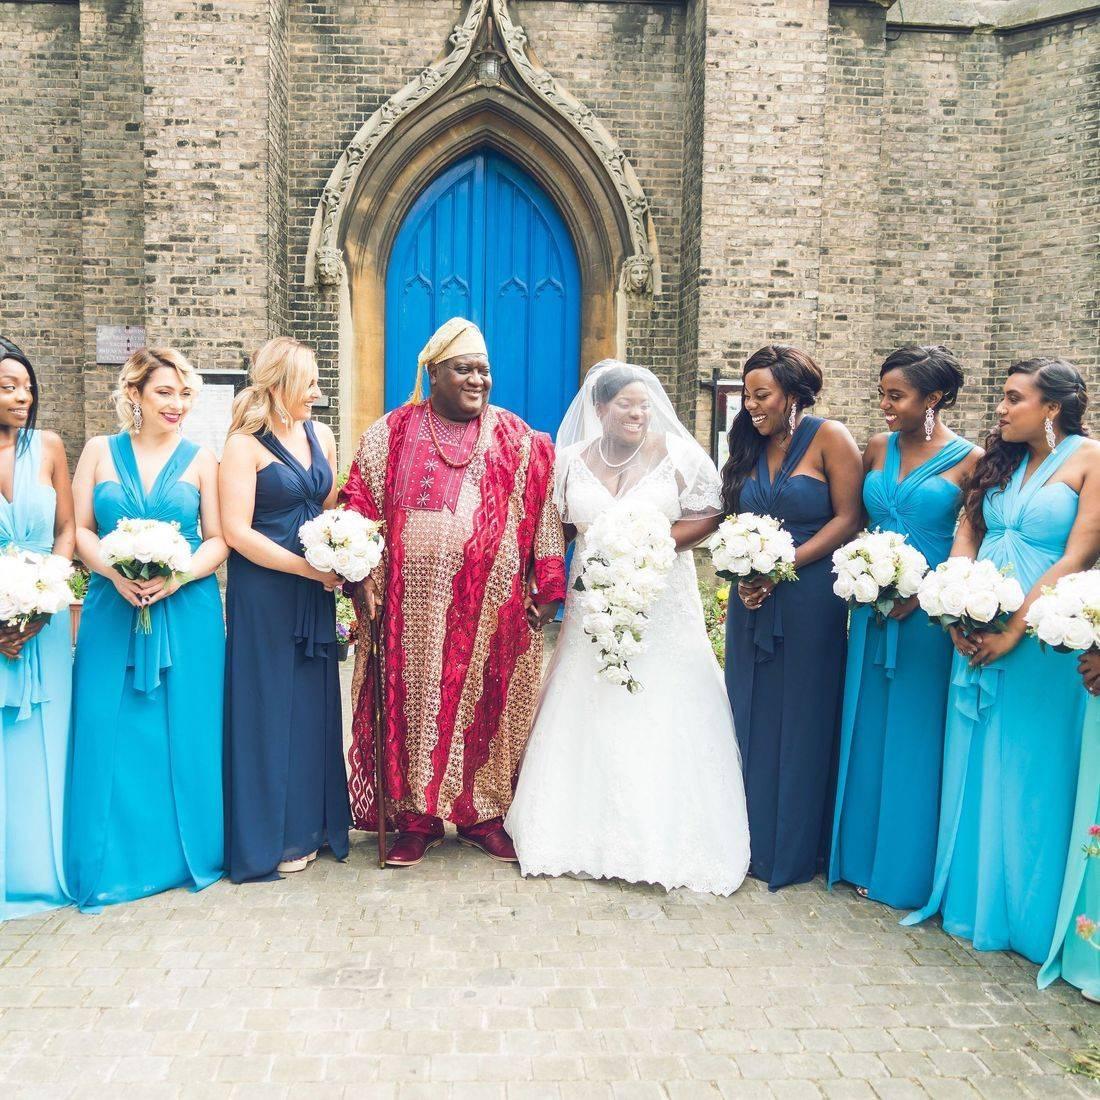 Wedding dress and 8 bridesmaids!